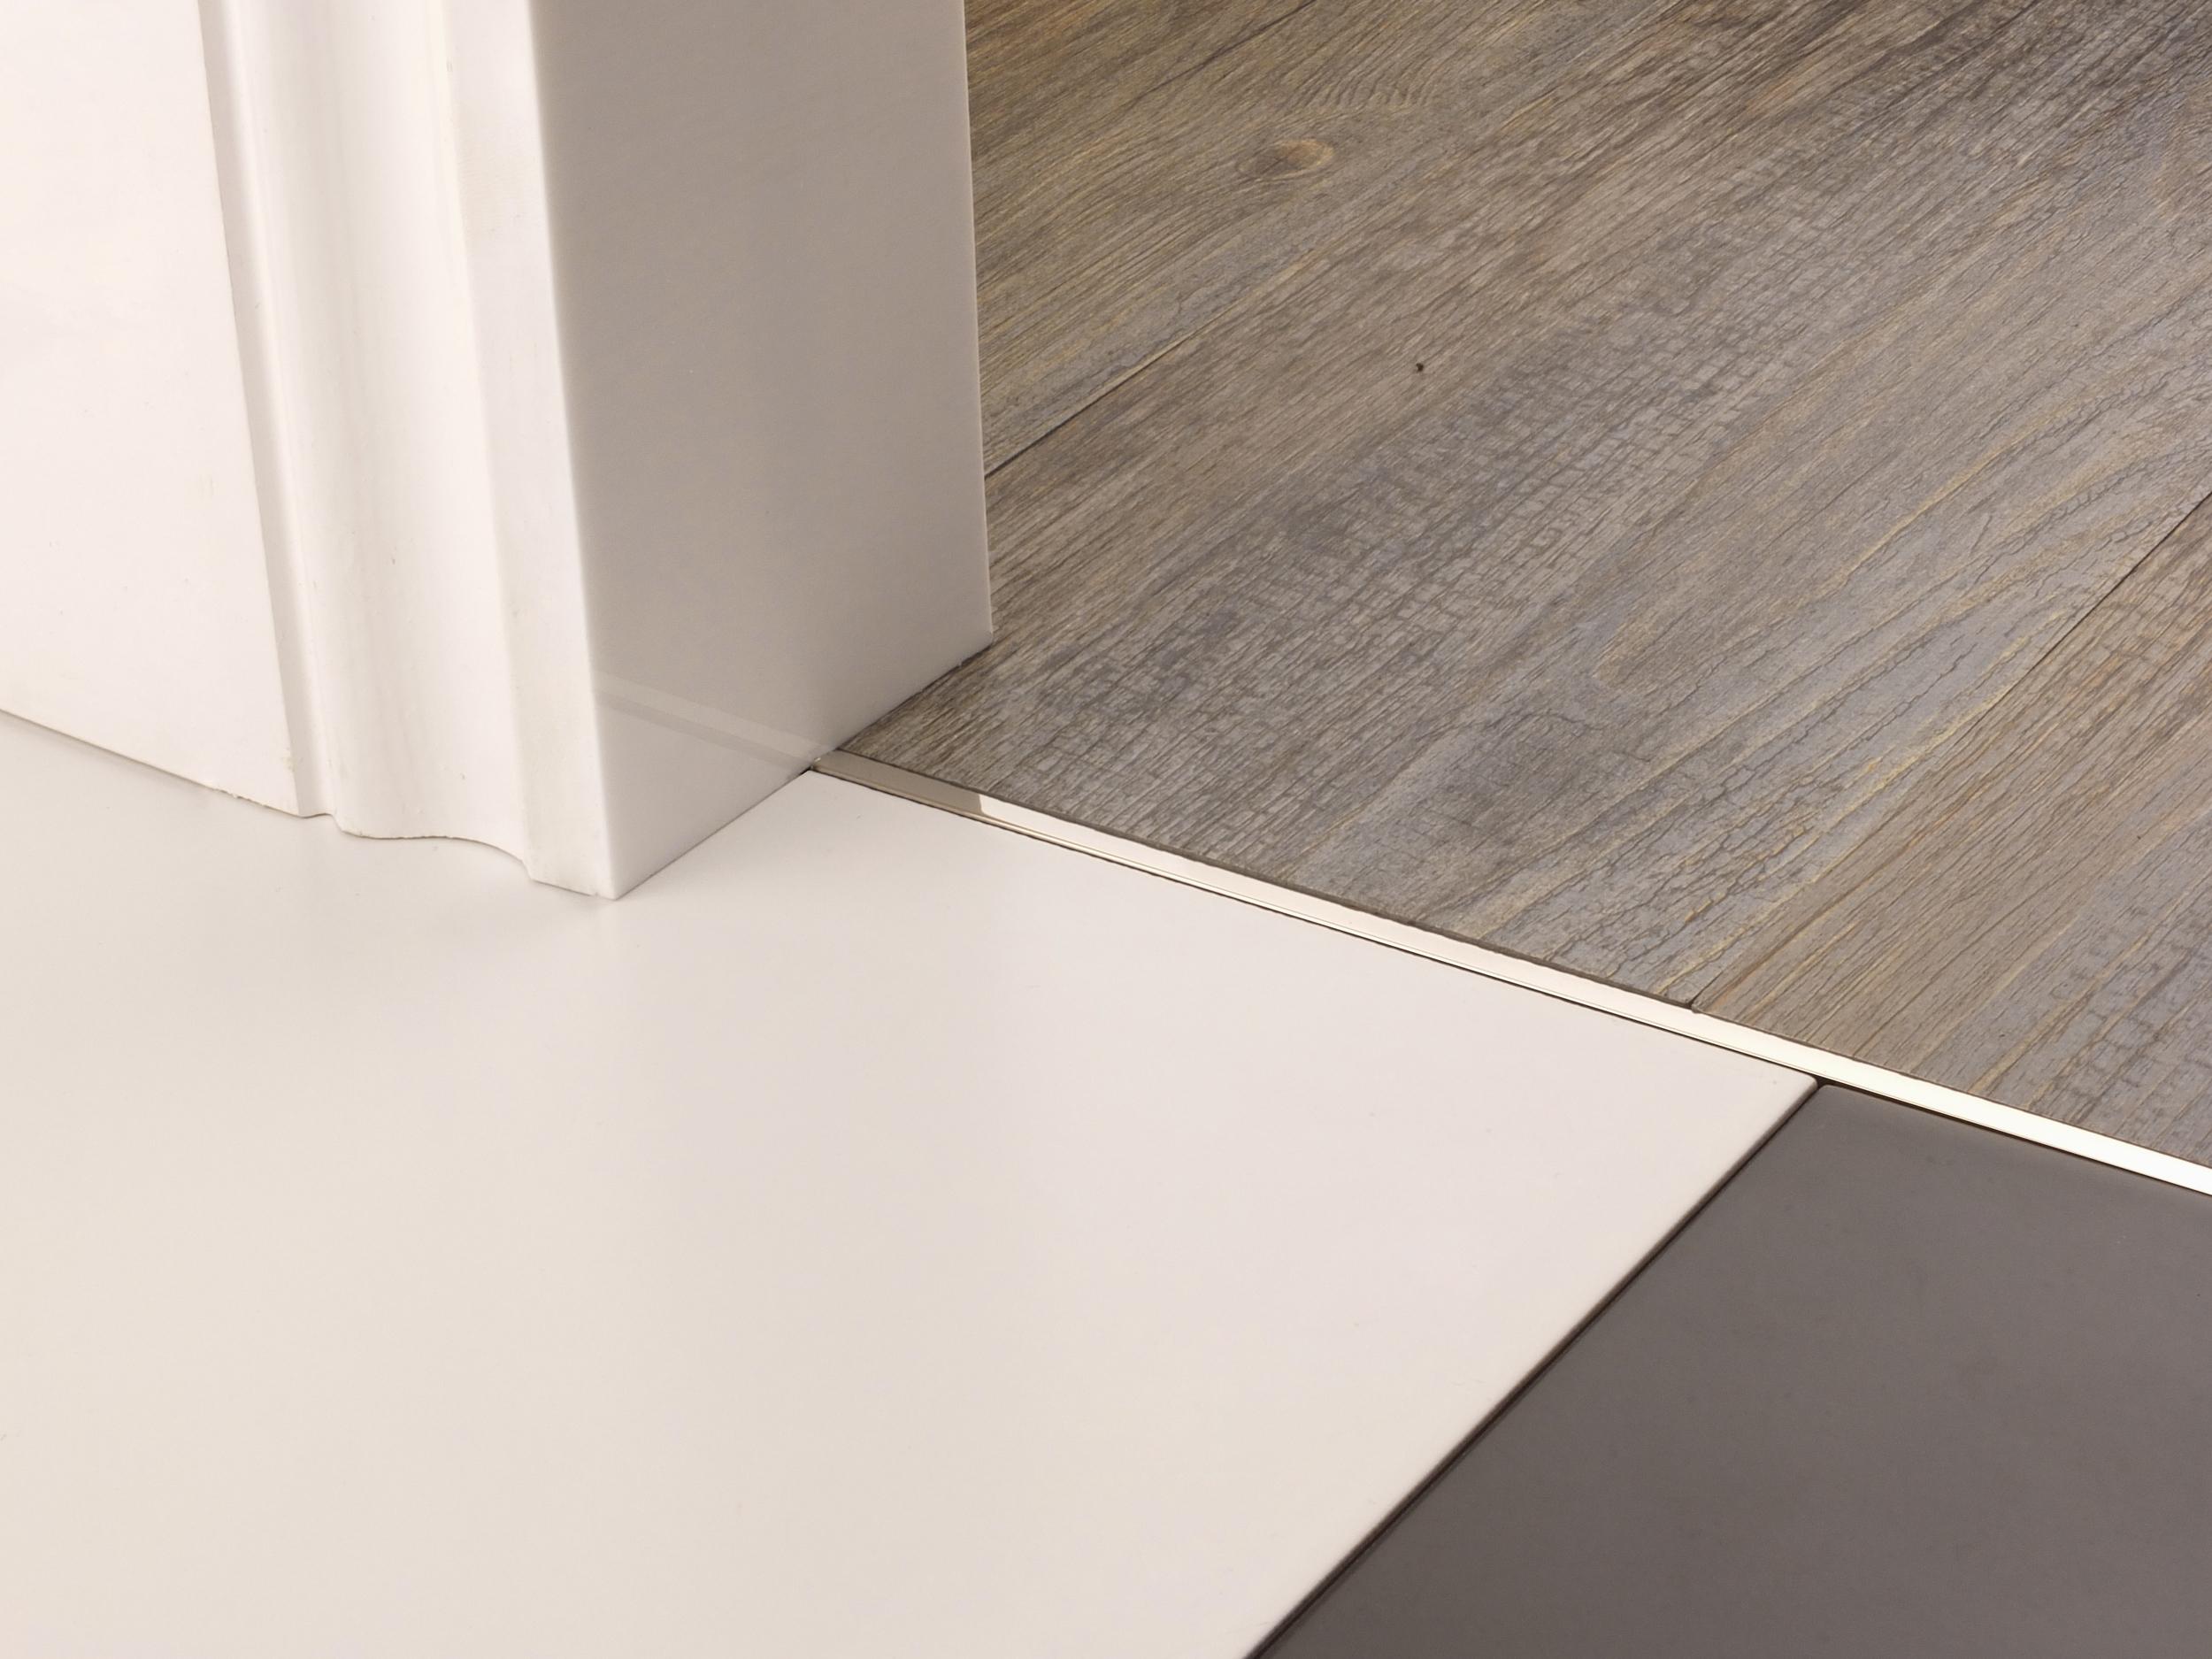 stairrods-doorbar-polished-nickel-divider-HFHF.jpg